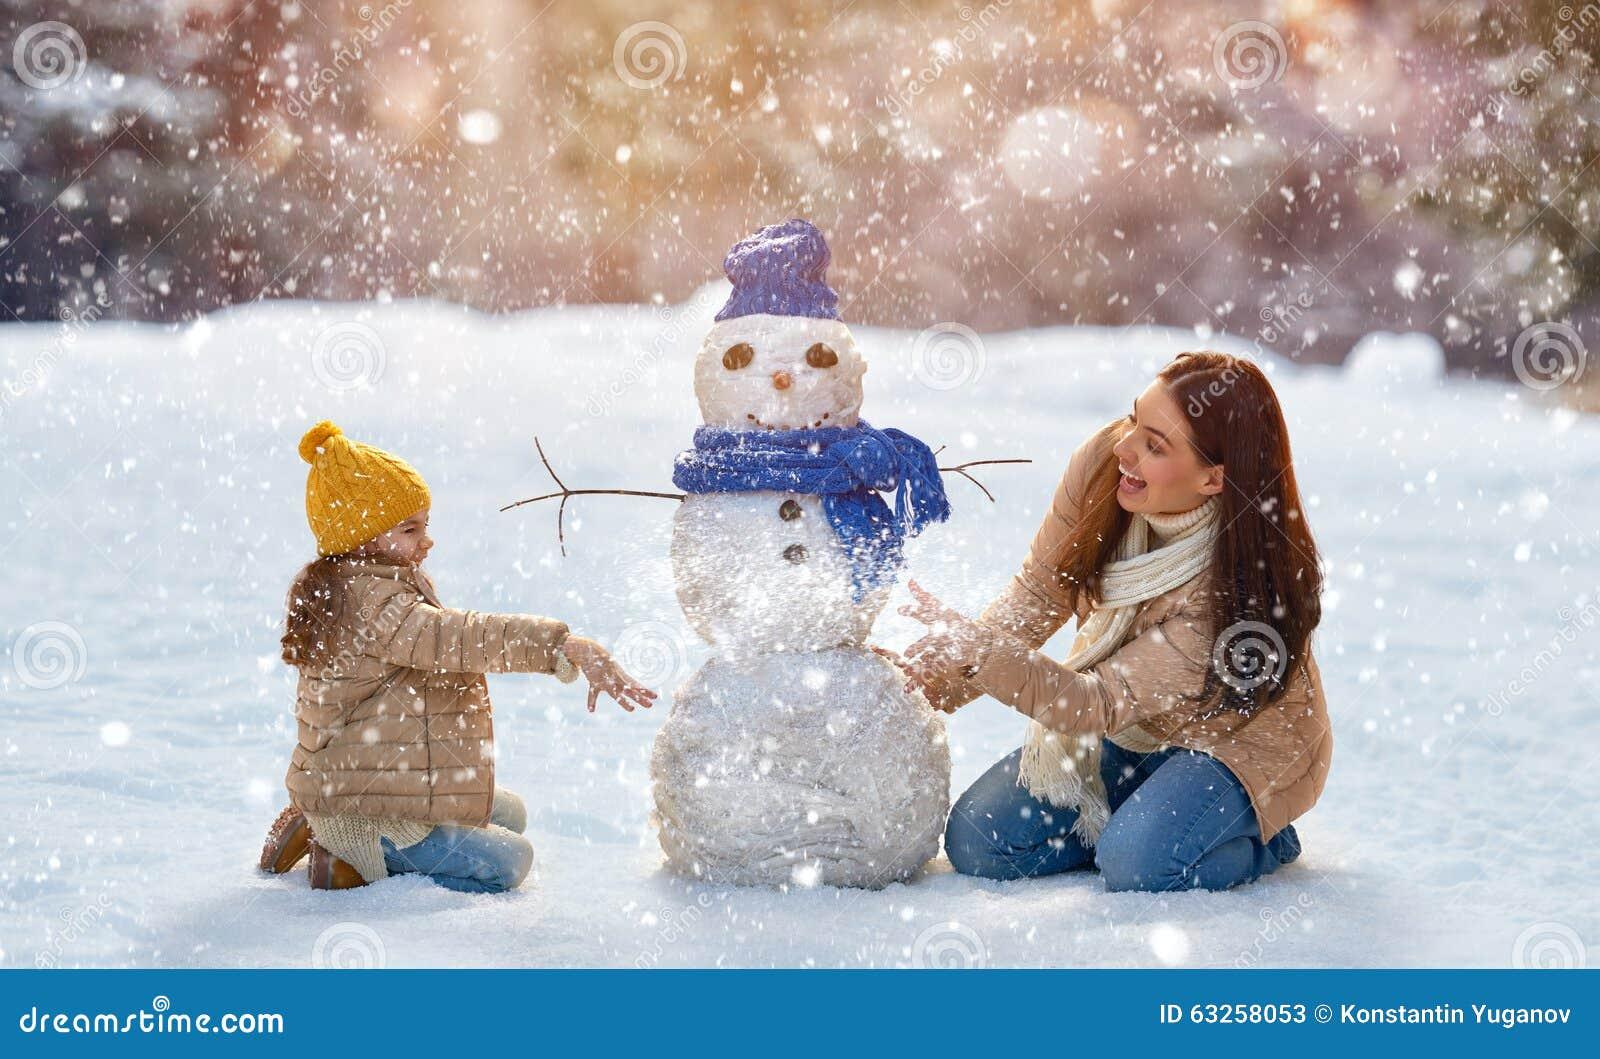 Девушка матери и ребенка на зиме идет в природу